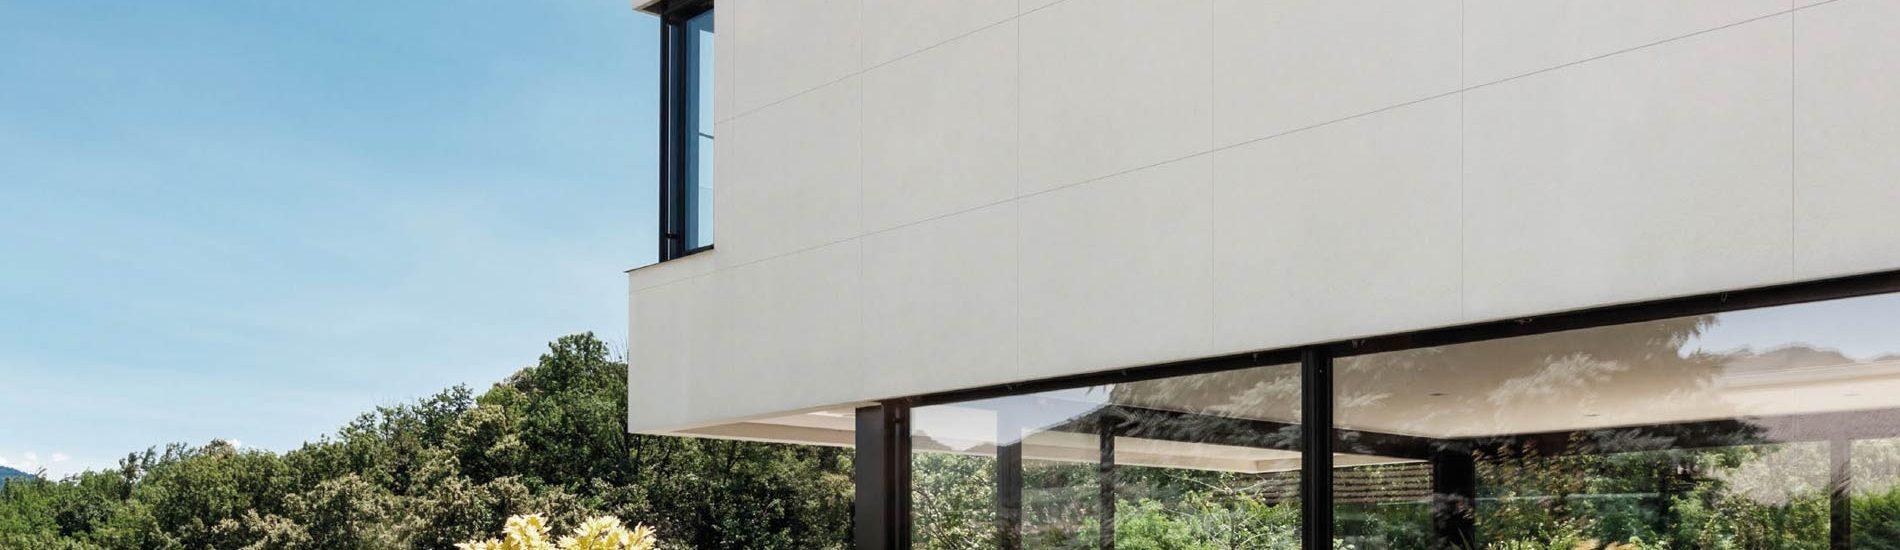 banner-city-spanish-modern-look-floor-wall-tile